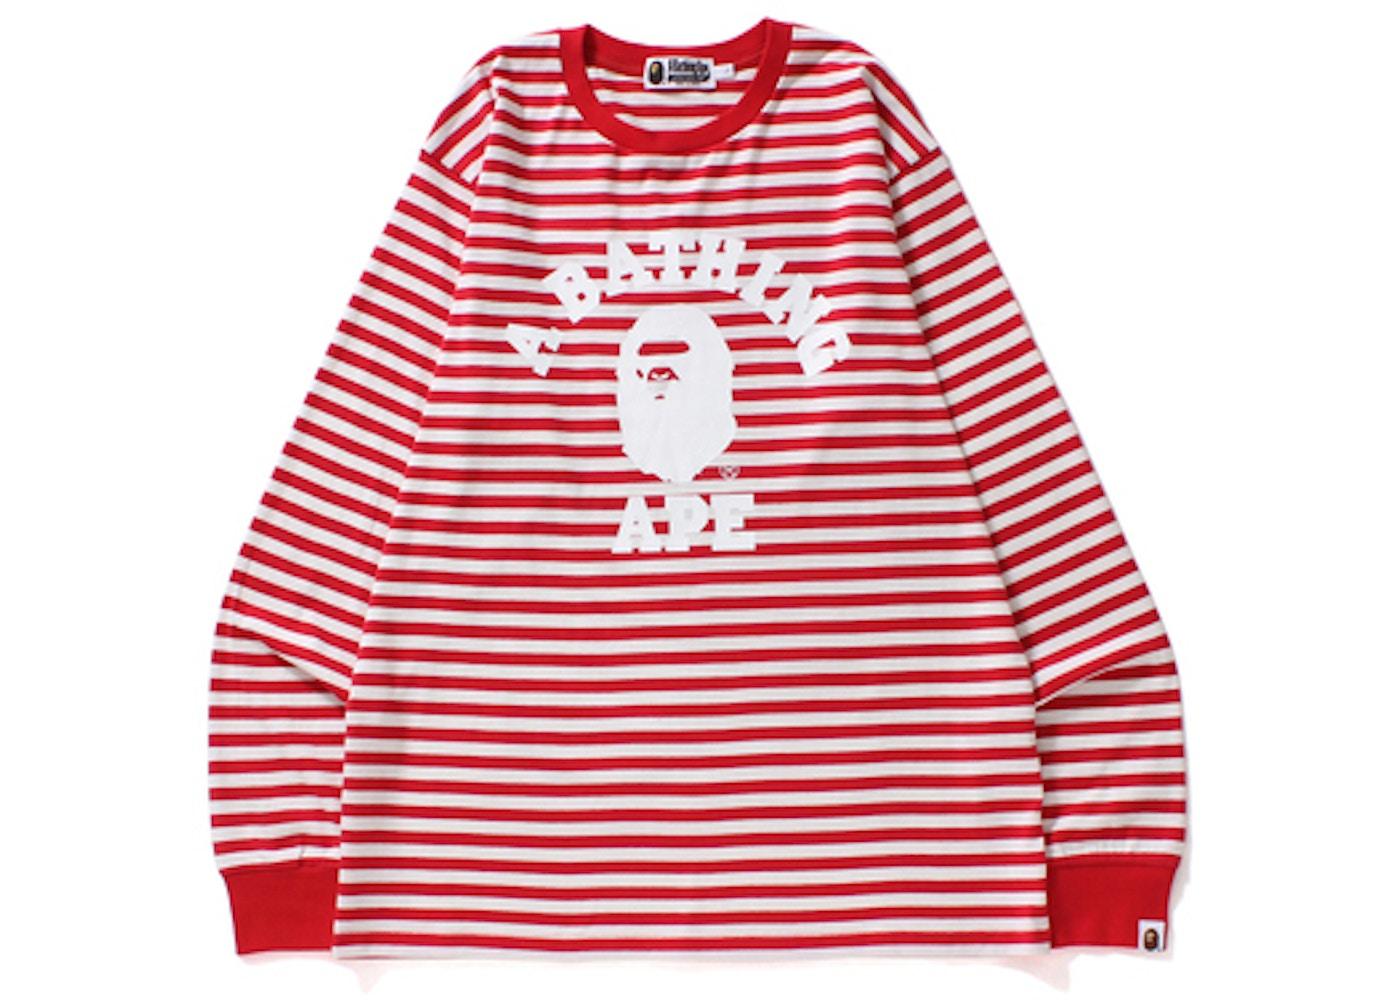 7348d17f BAPE College Hoop Long Sleeve Tee Pink/White -